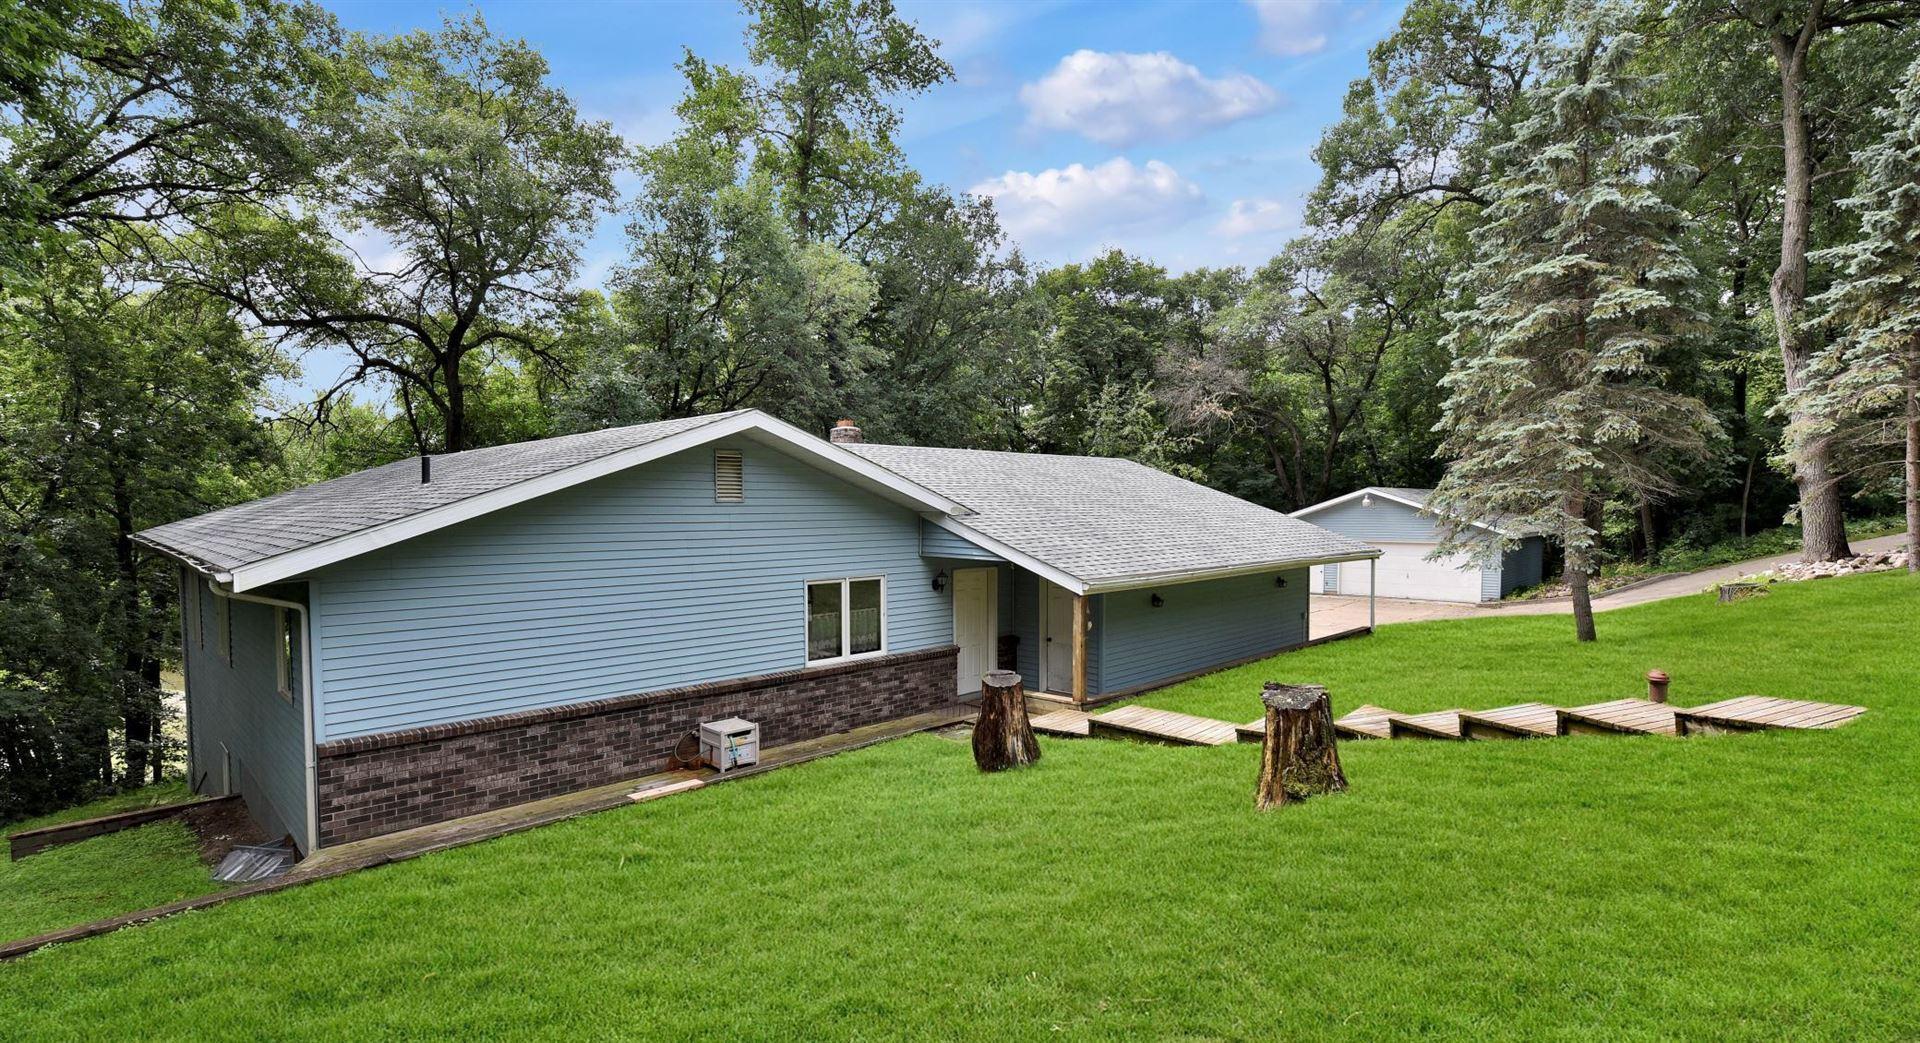 15172 Riverside Drive, Brainerd, MN 56401 - MLS#: 5621353